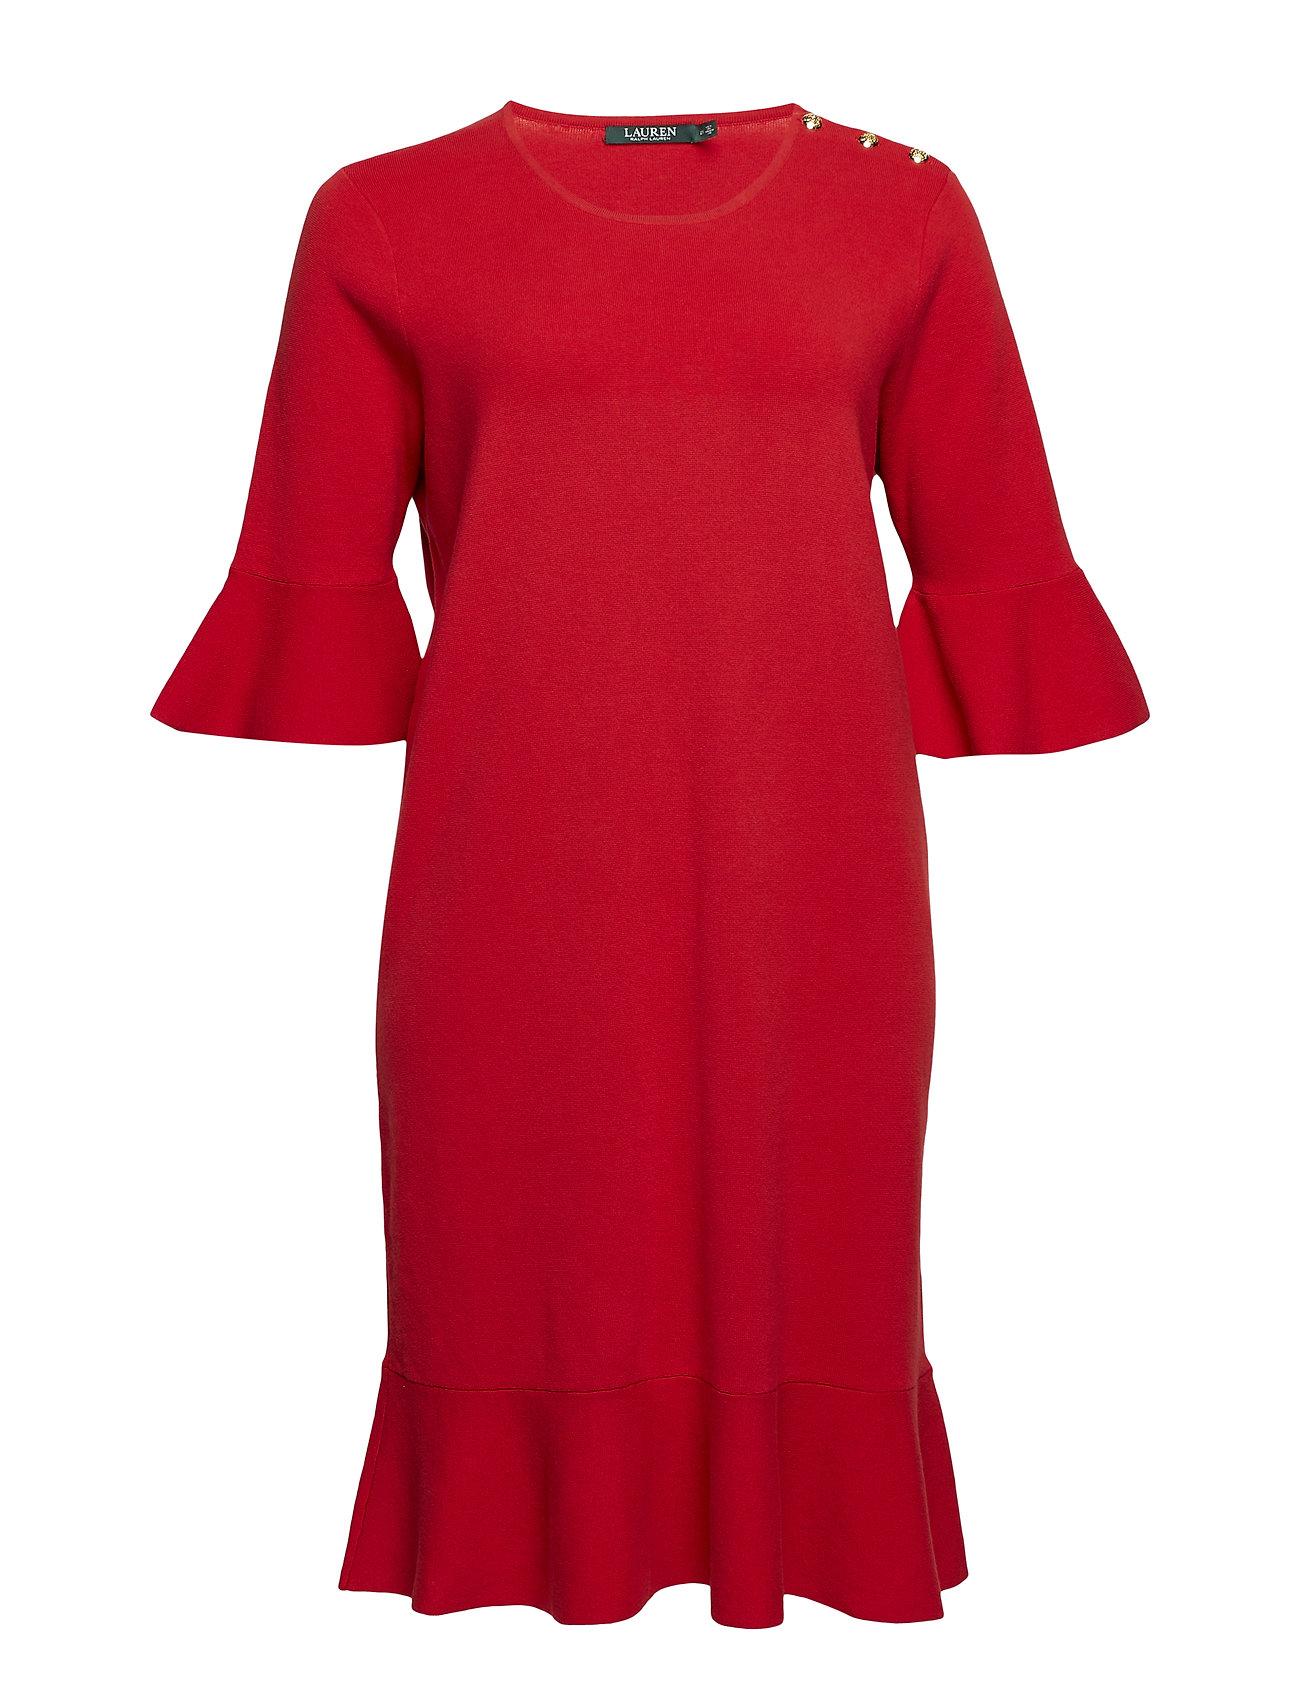 Lauren kvinnor Ruffled Cotton Blend Dress Klänningar